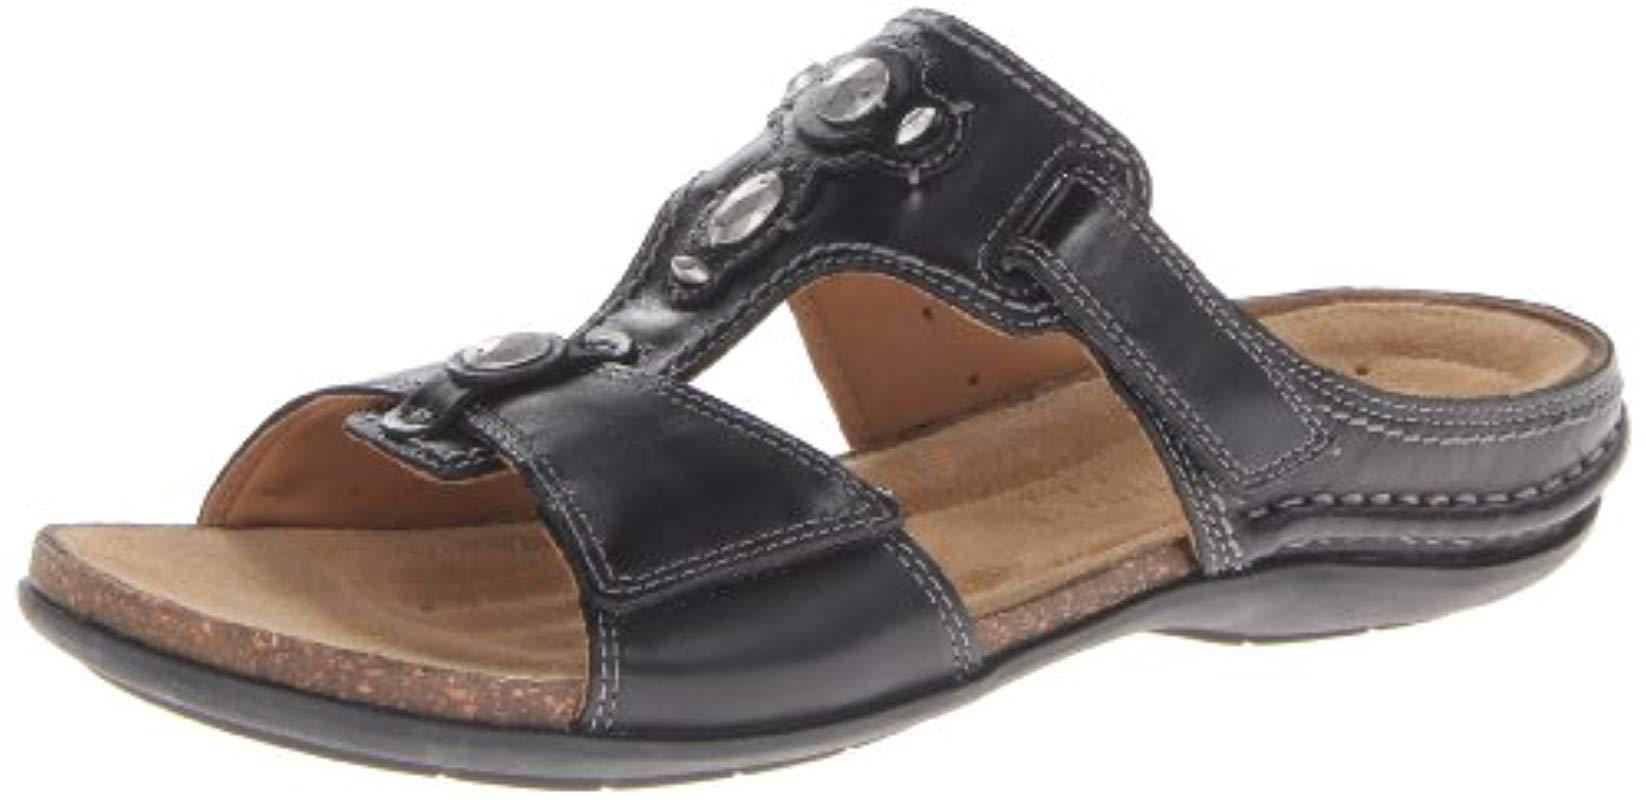 46ea85f3e Lyst - Clarks Palmarita Gladiator Sandal in Black - Save 20%